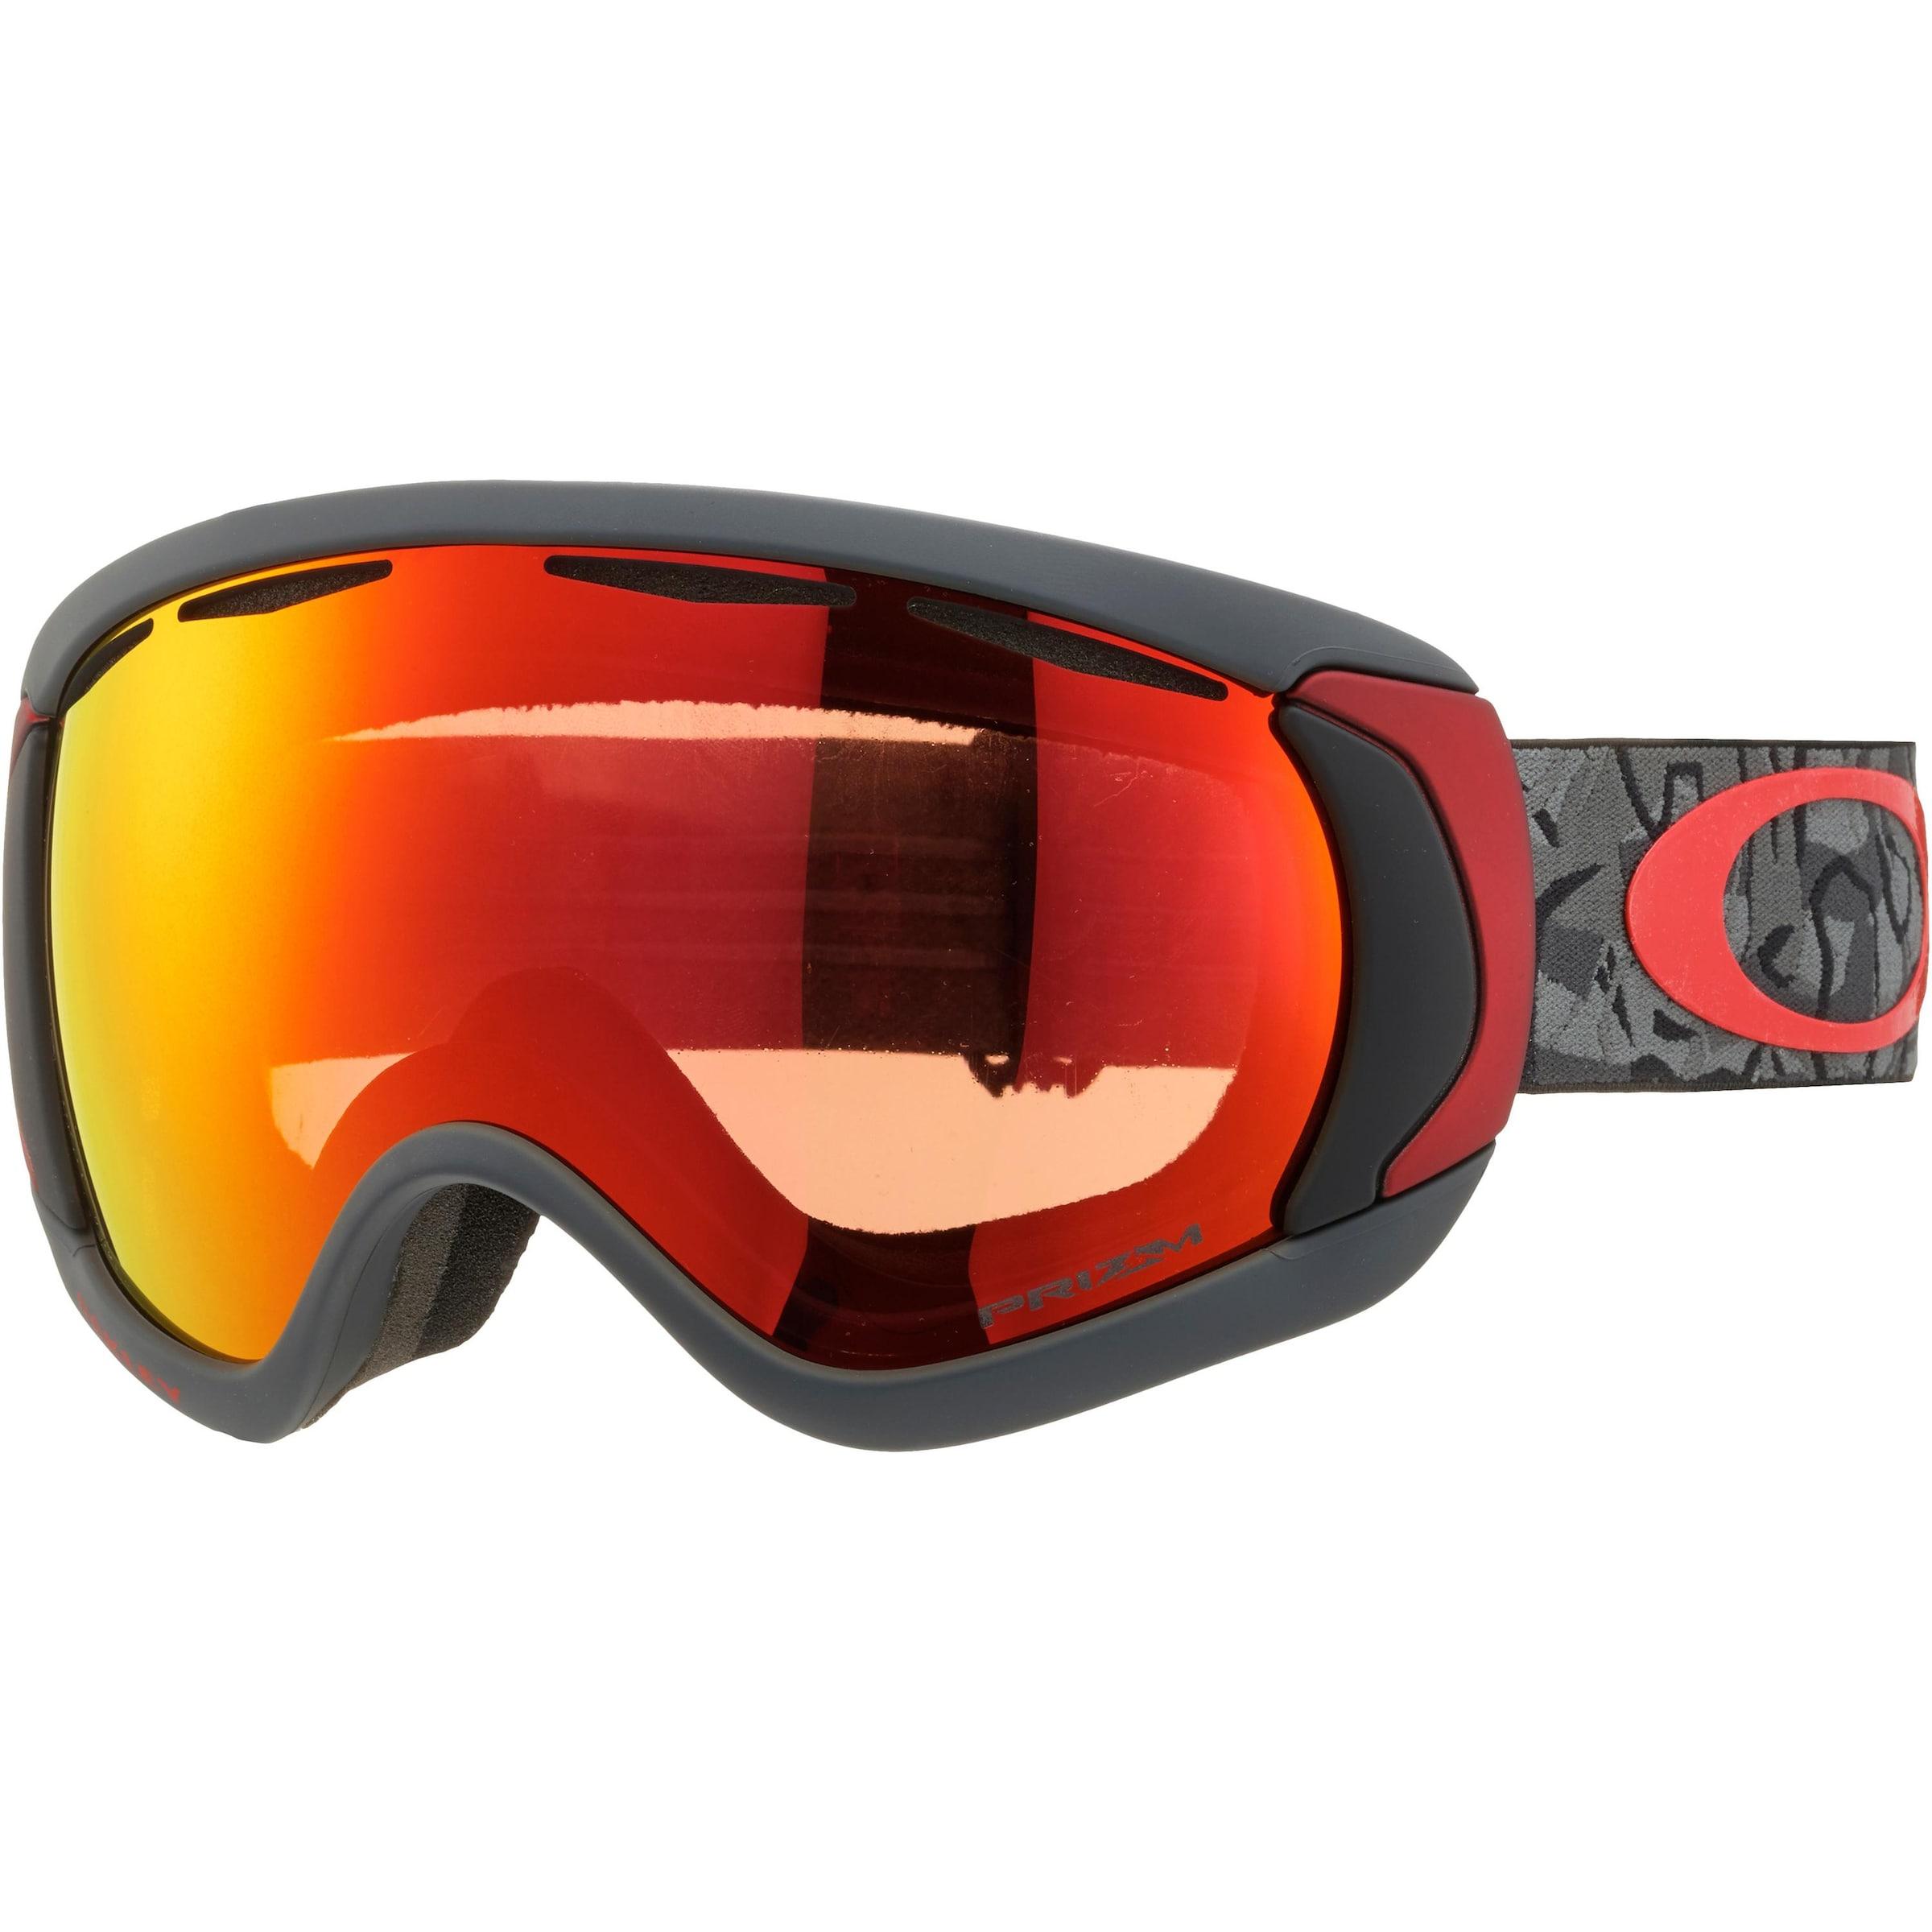 Oakley Iridium' Prizm AnthrazitRauchgrau Orangerot Skibrille 'canopy In Porch O0nyN8wvm